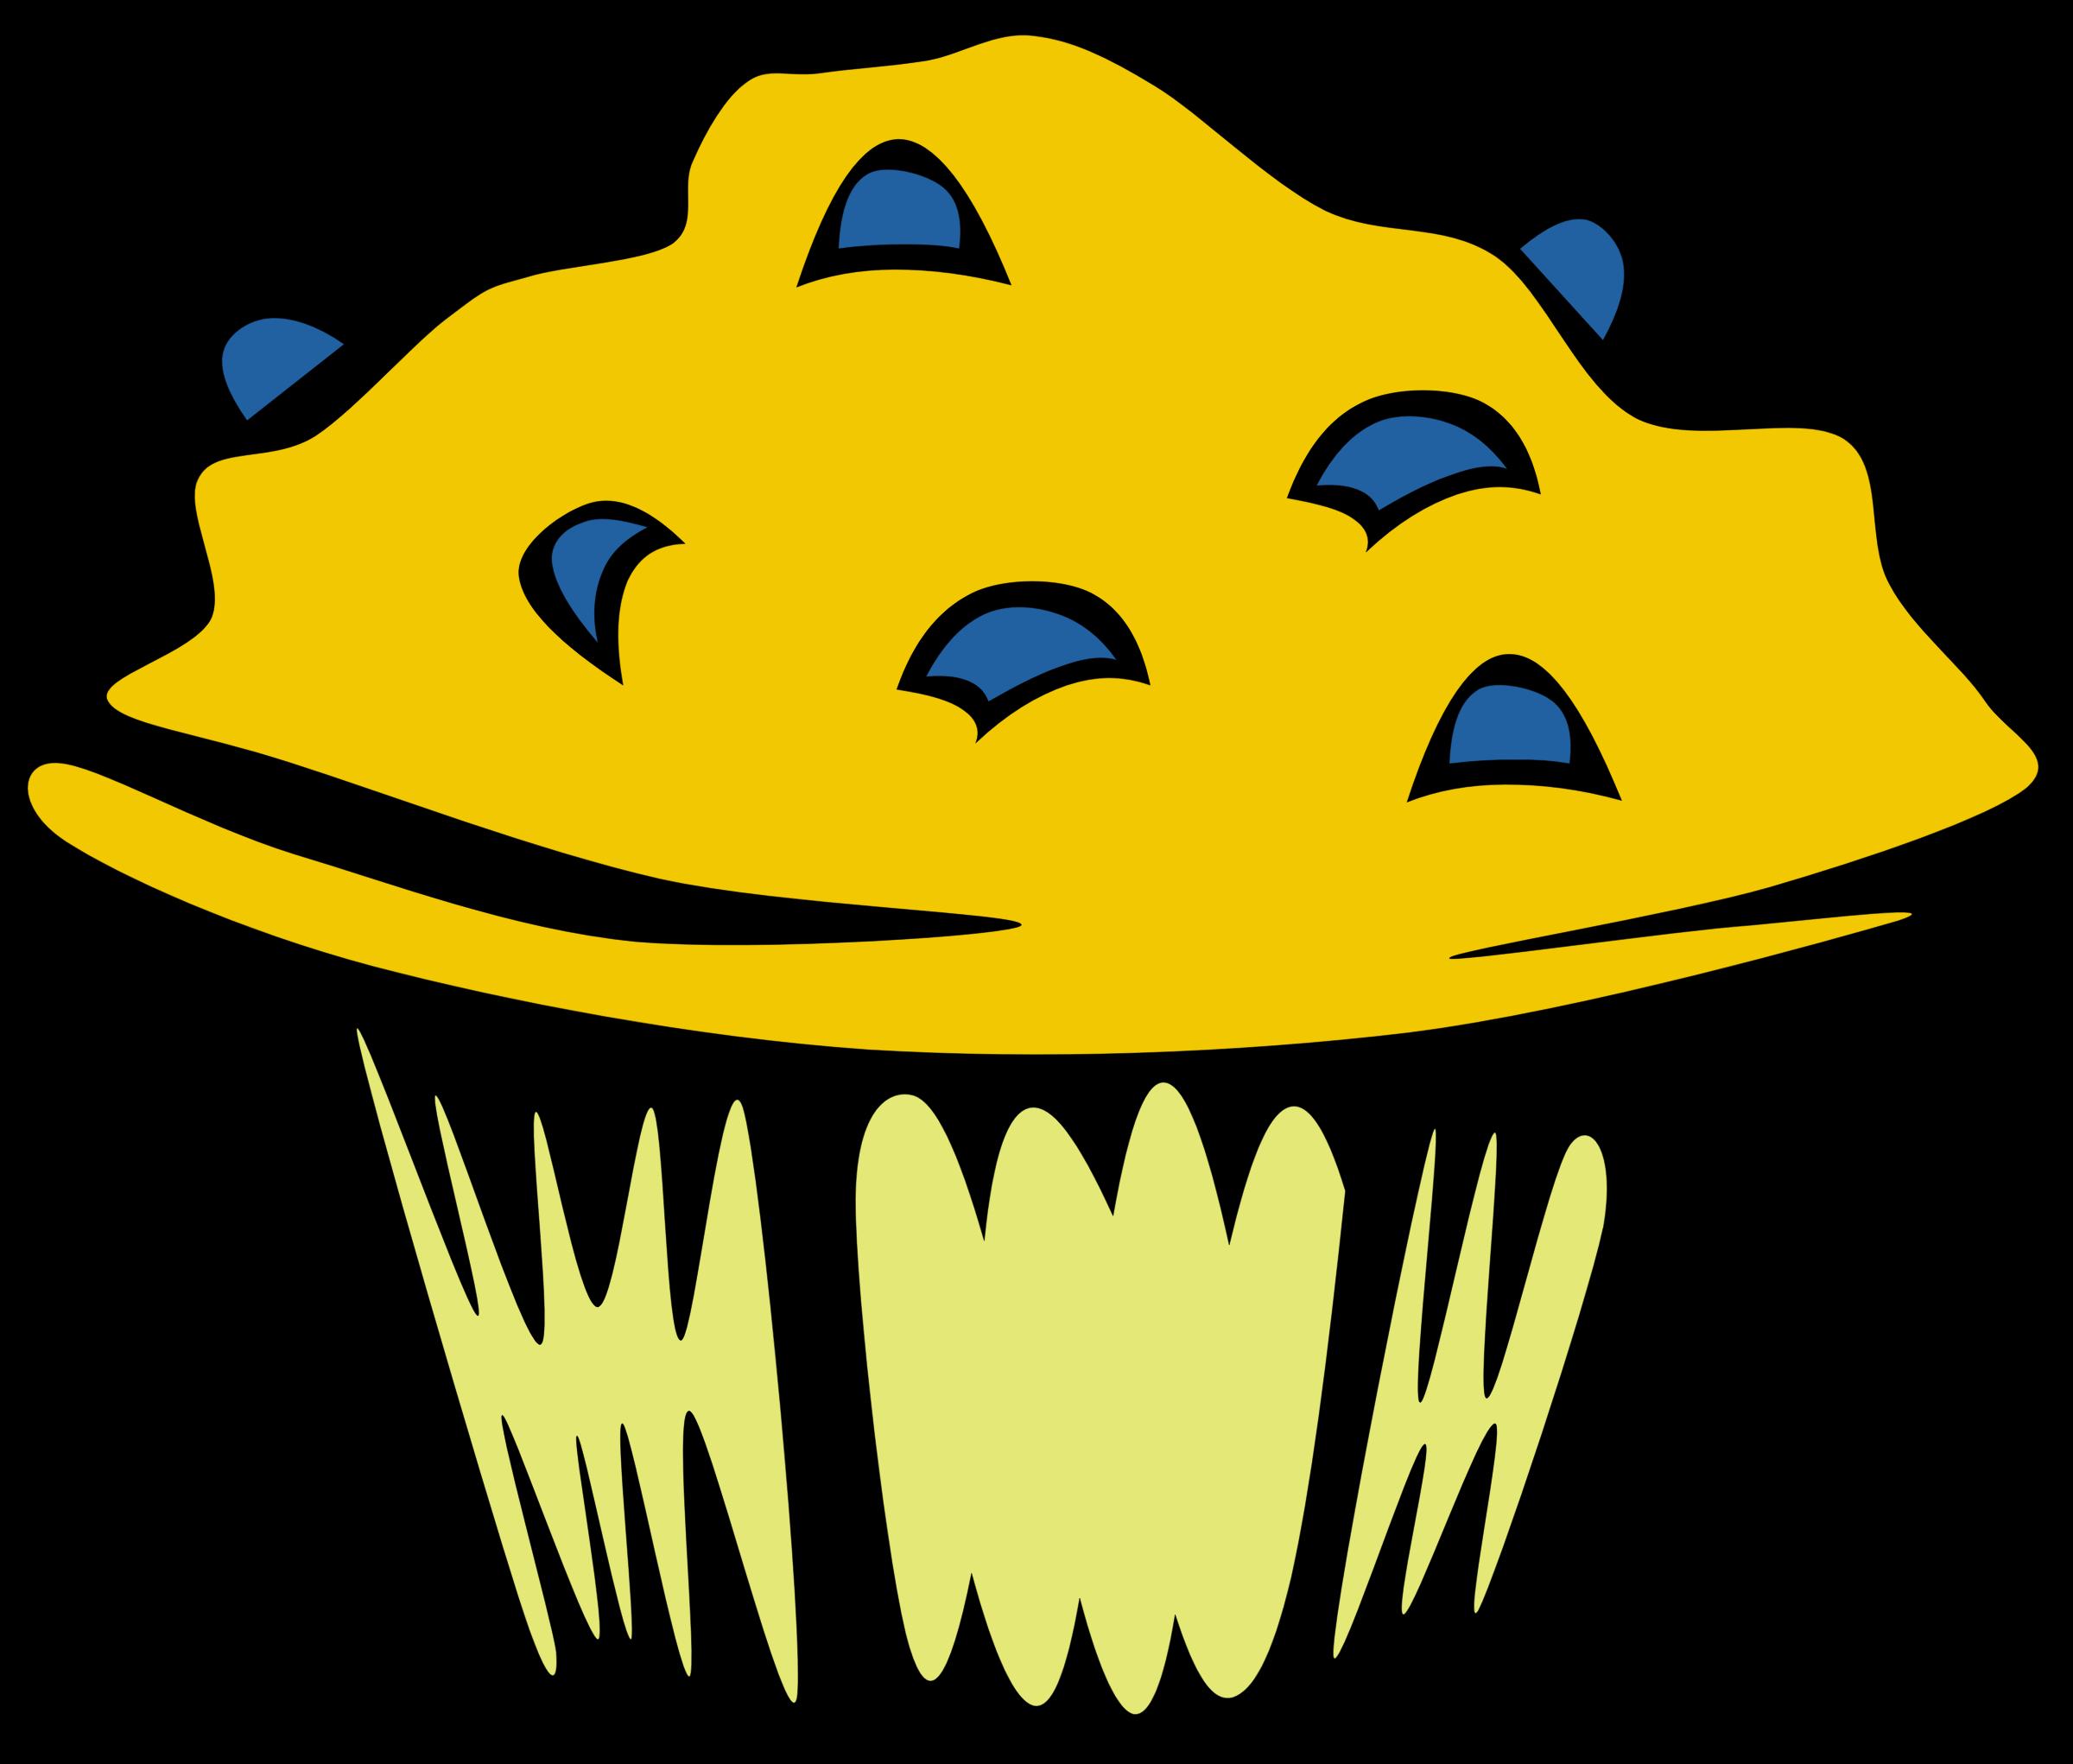 Muffin clipart banana muffin Clipart Muffin Food Blueberry Fast